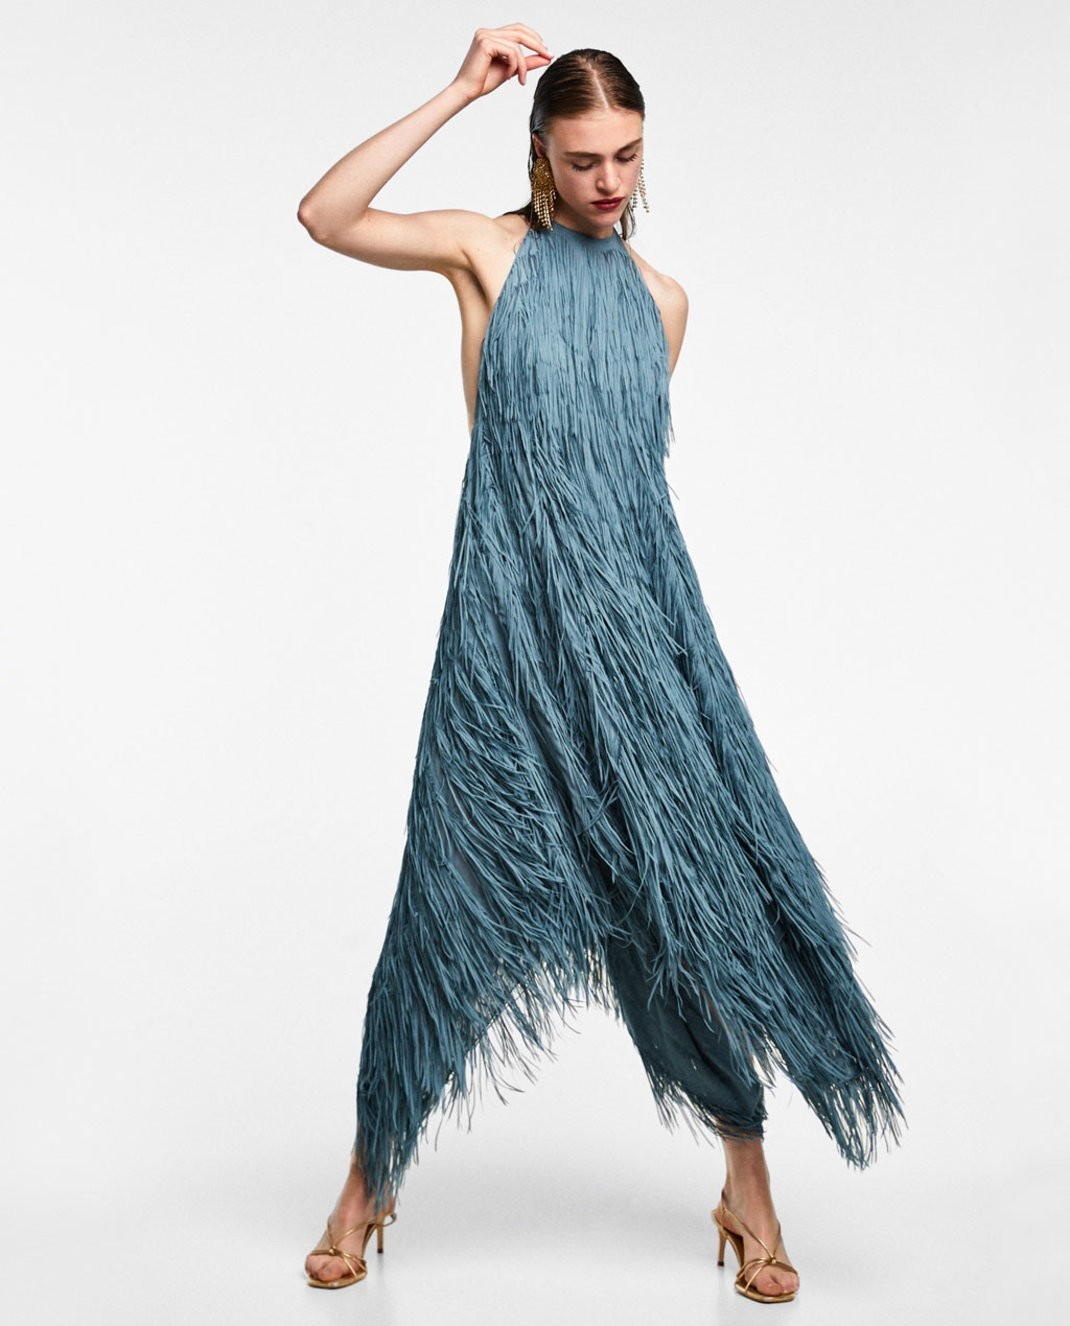 61ec4c8fb523 Η κληρονόμος των Zara με το εντυπωσιακότερο φόρεμα της νέας συλλογής ...